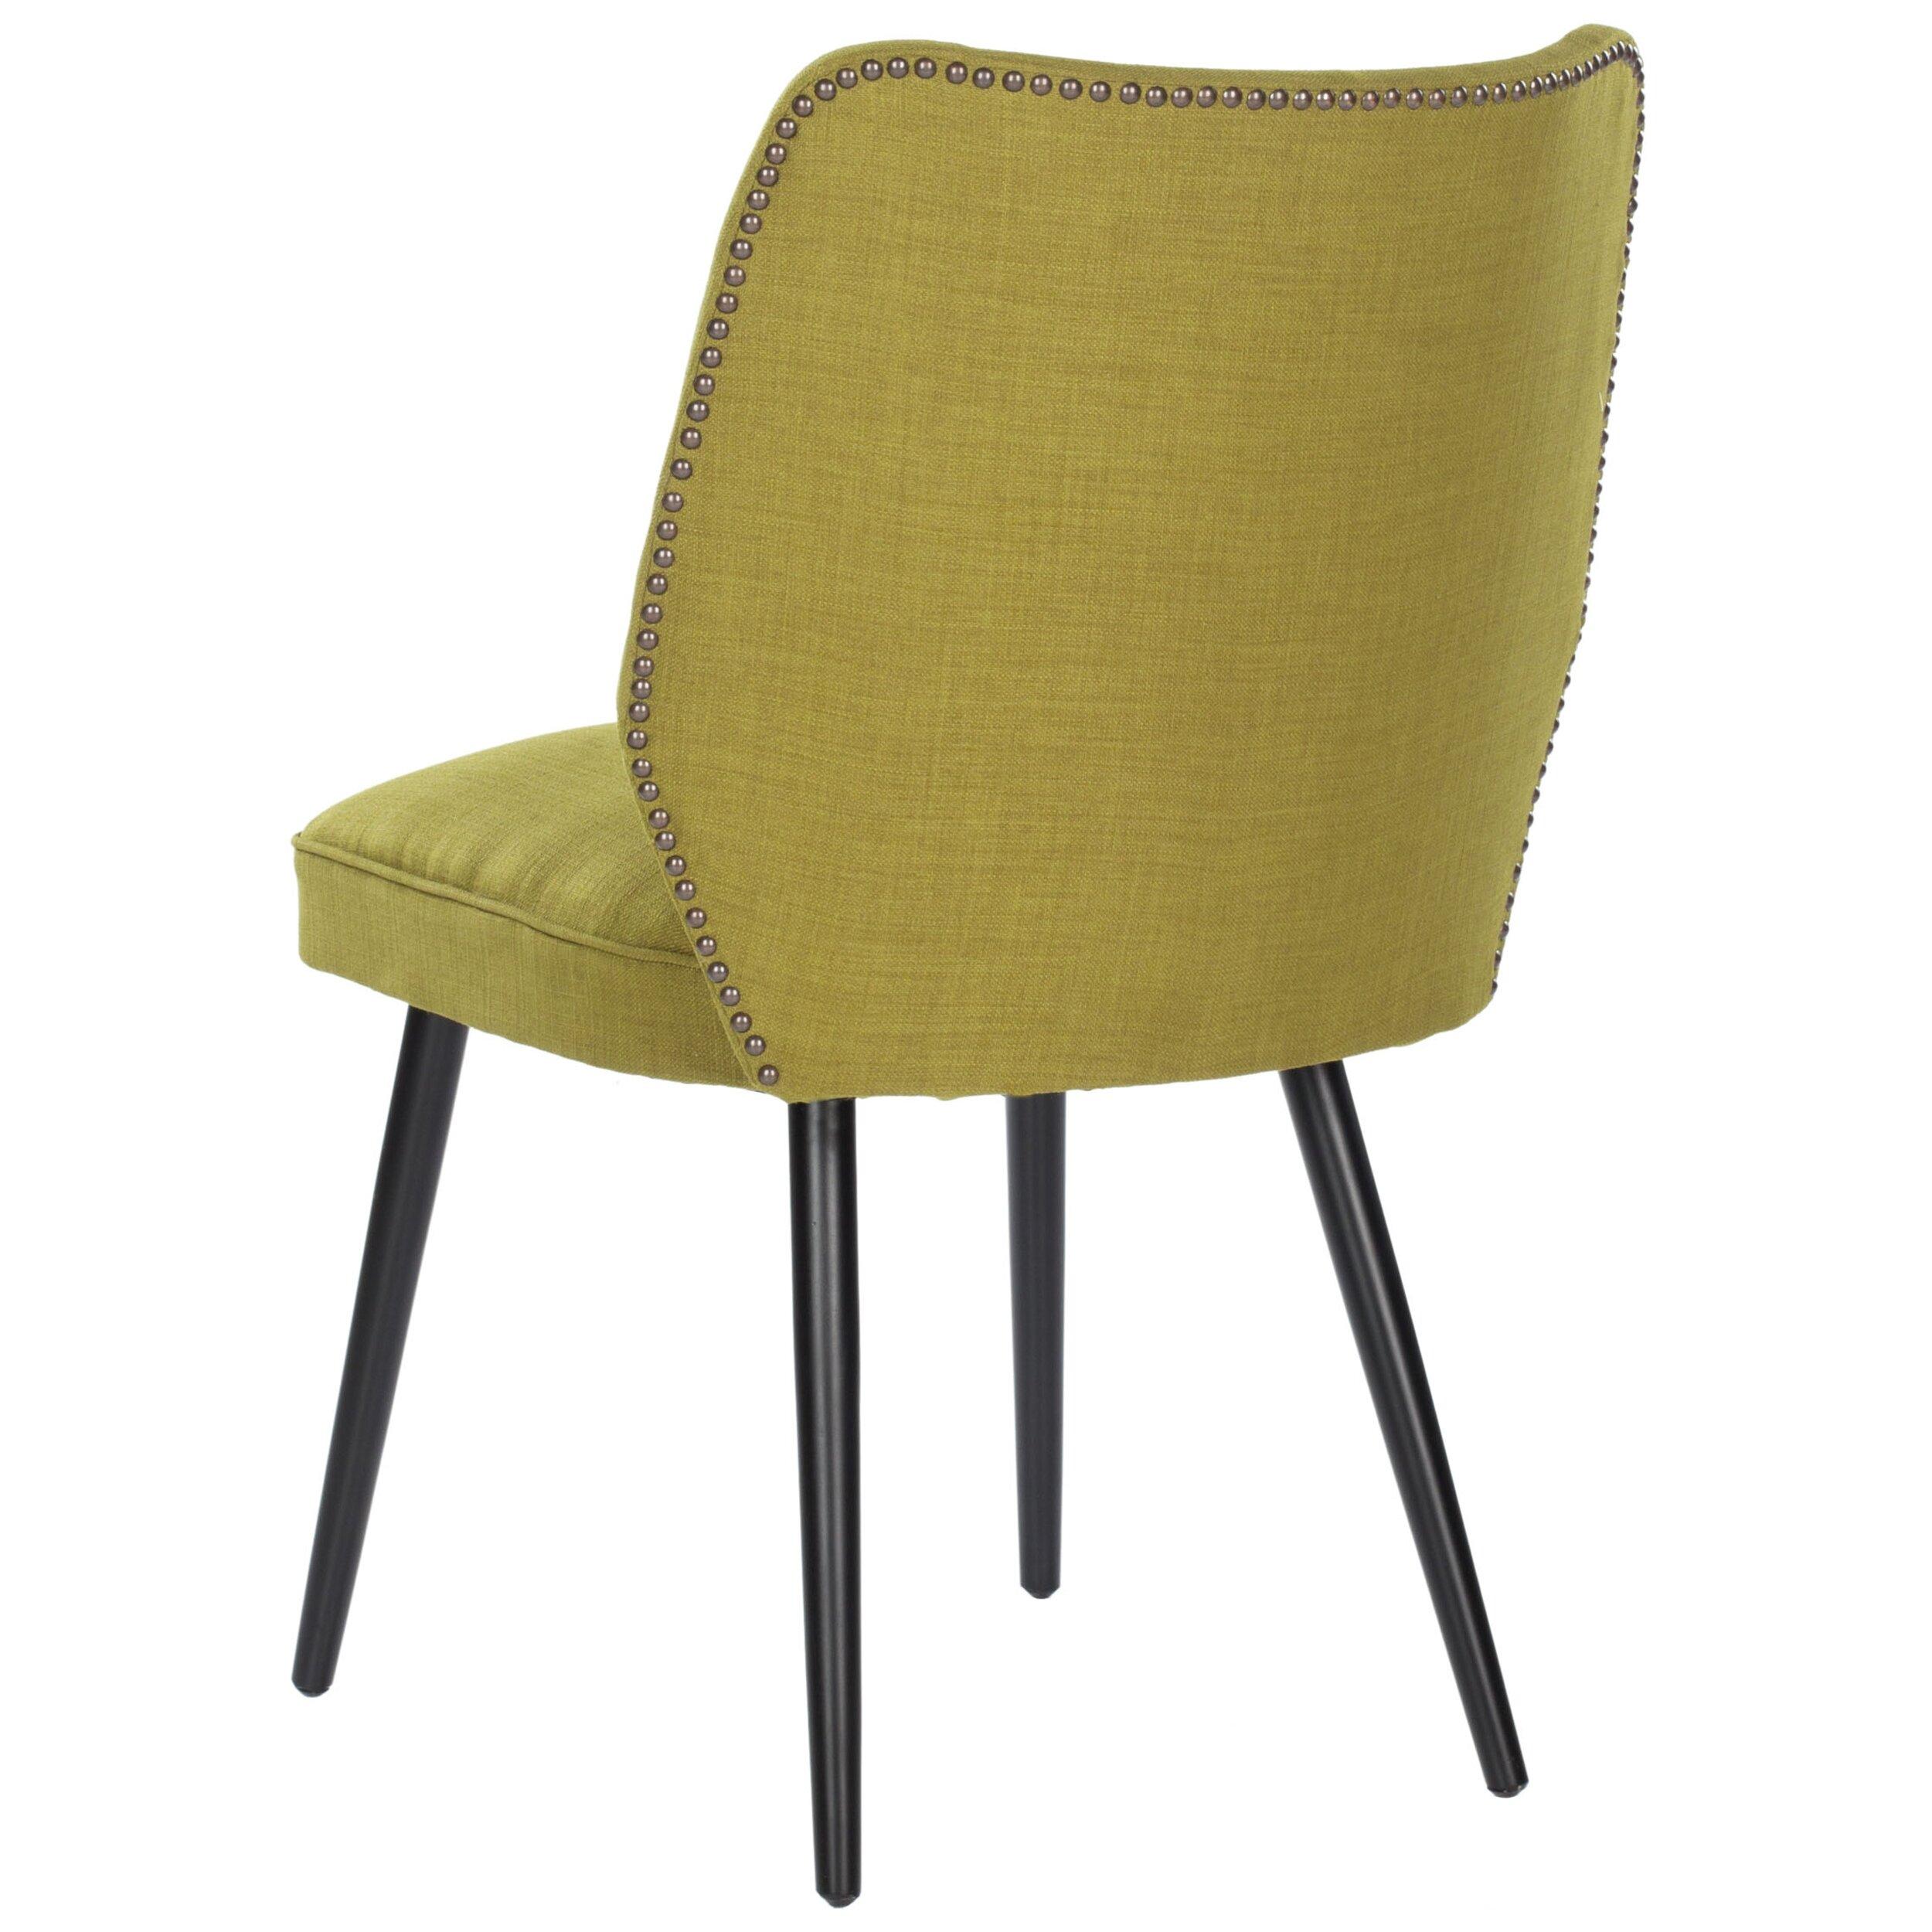 Safavieh Zara Side Chair amp Reviews Wayfair : Safavieh Zara Side Chair MCR4611B SET2 from www.wayfair.com size 2500 x 2500 jpeg 595kB